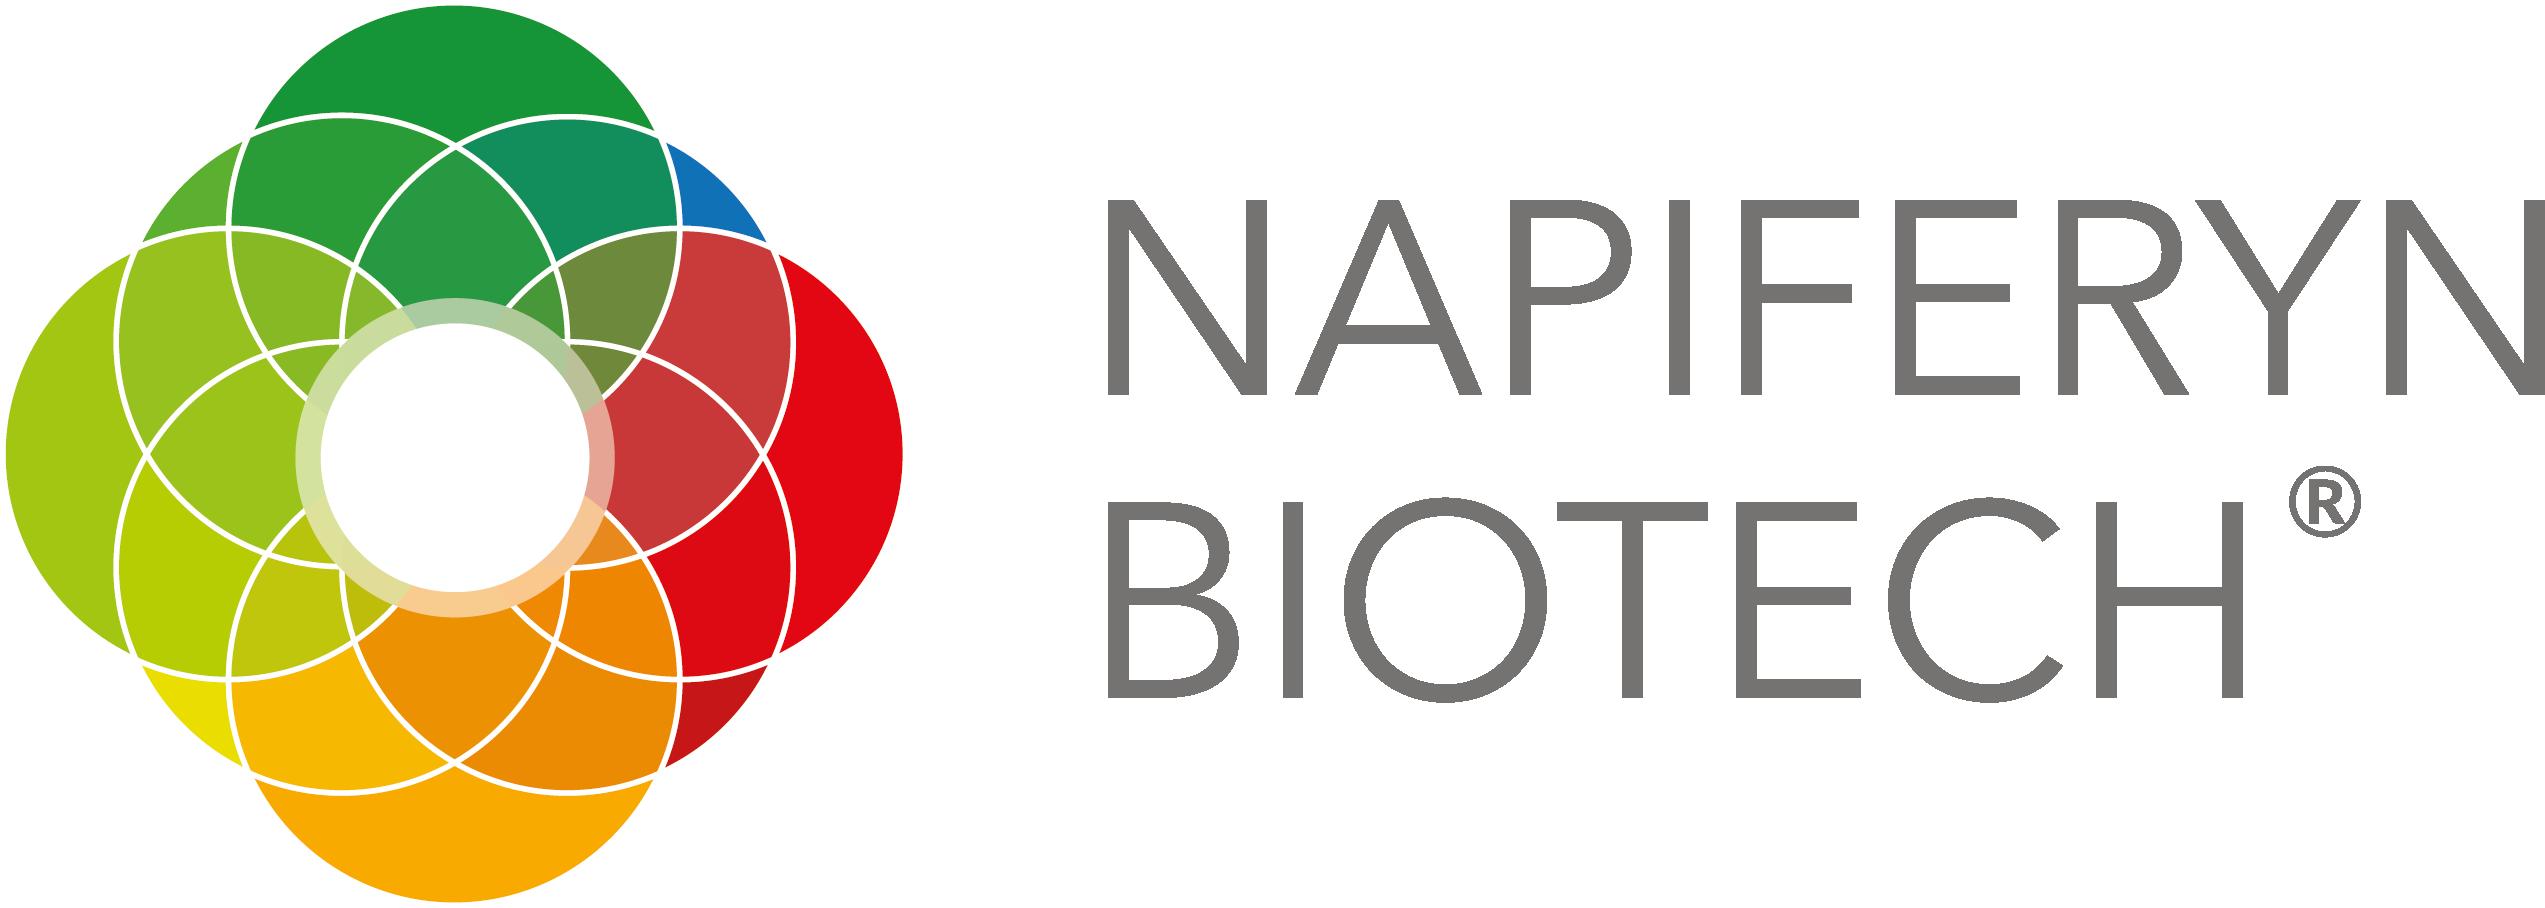 NapiFeryn BioTech